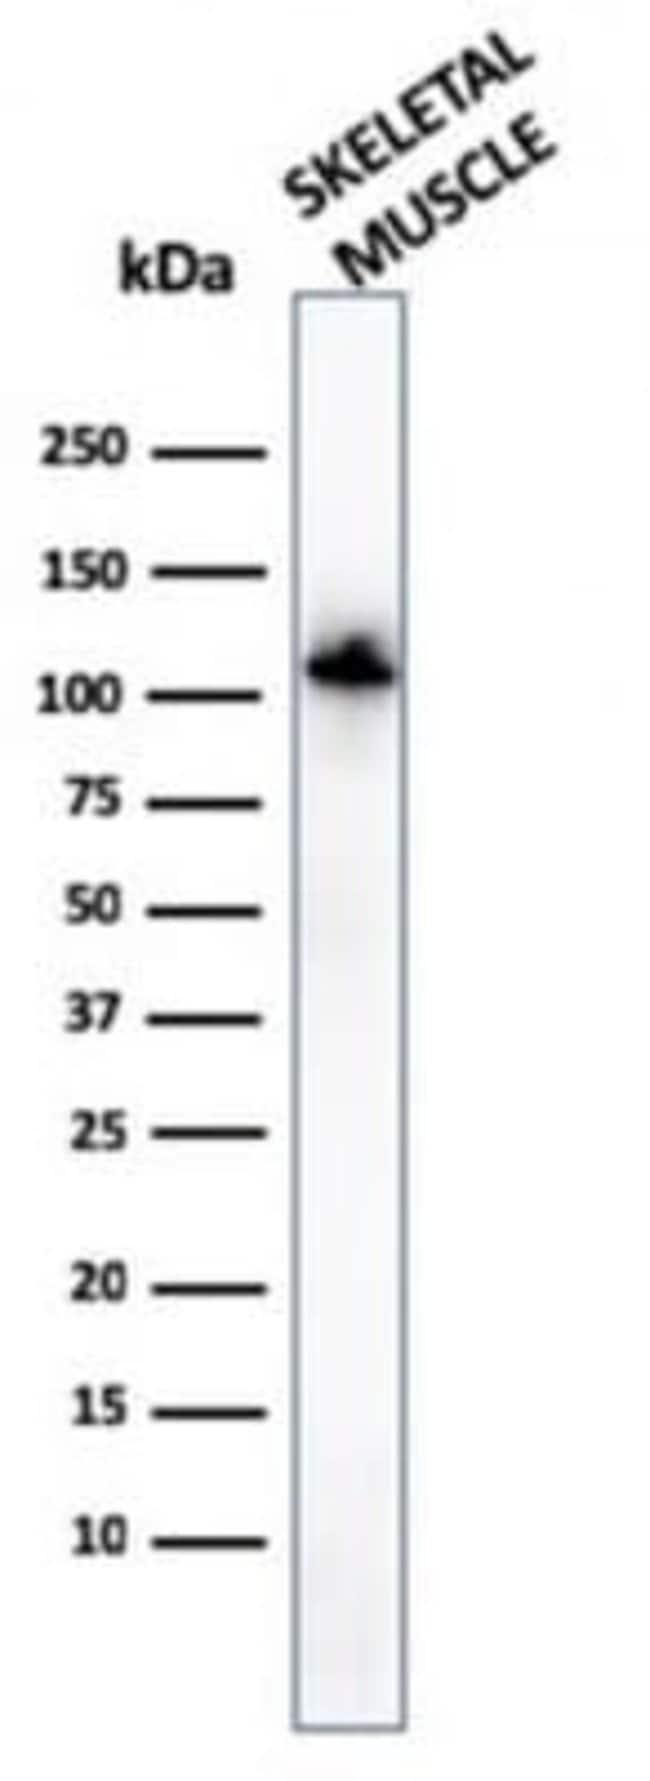 Alpha Actinin 2 Mouse anti-Human, Clone: ACTN2/3294, Novus Biologicals:Antibodies:Primary